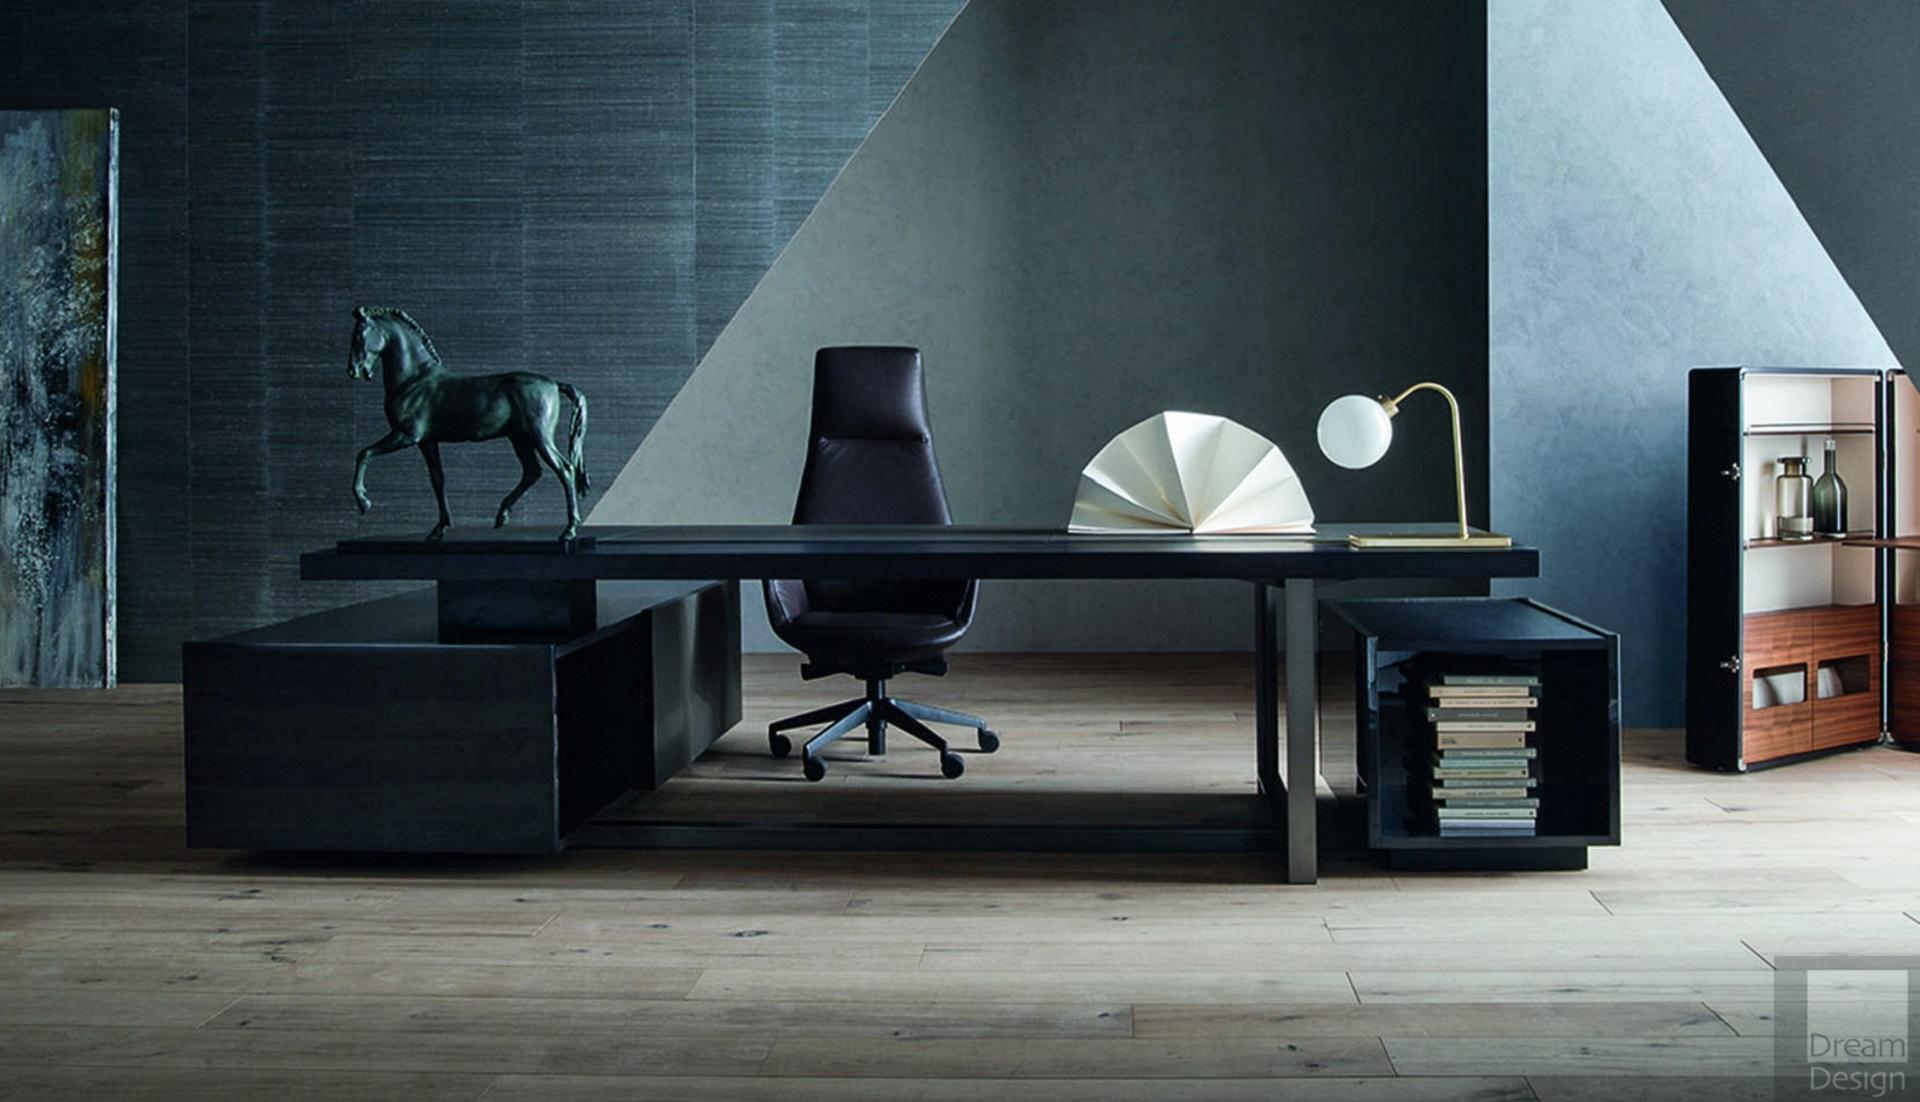 Poltrona frau jobs desk dream design interiors ltd - Poltrona design low cost ...